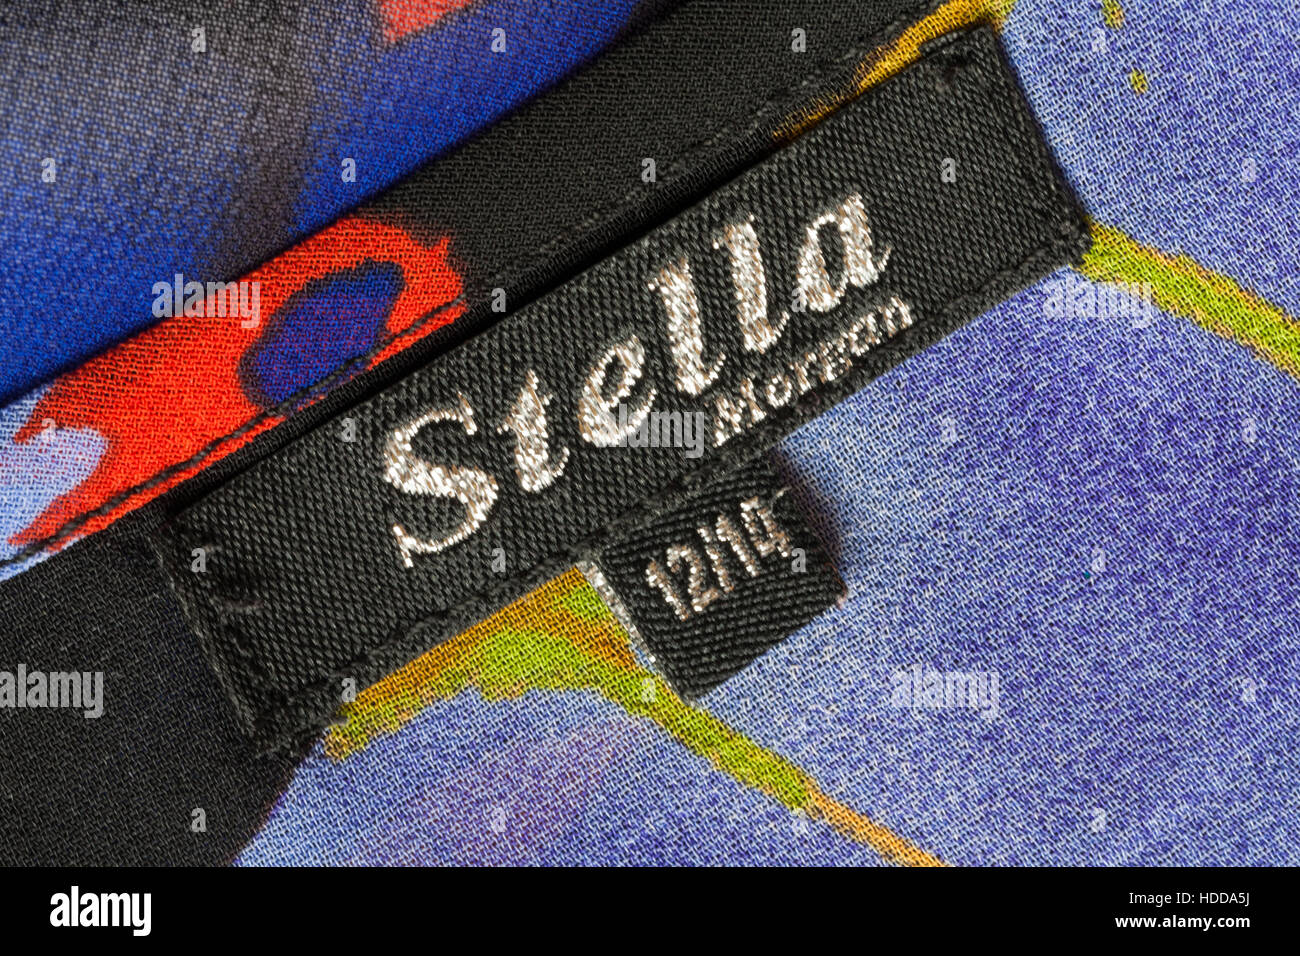 Stella Morgan label in woman's garment size 12/14 Stock Photo